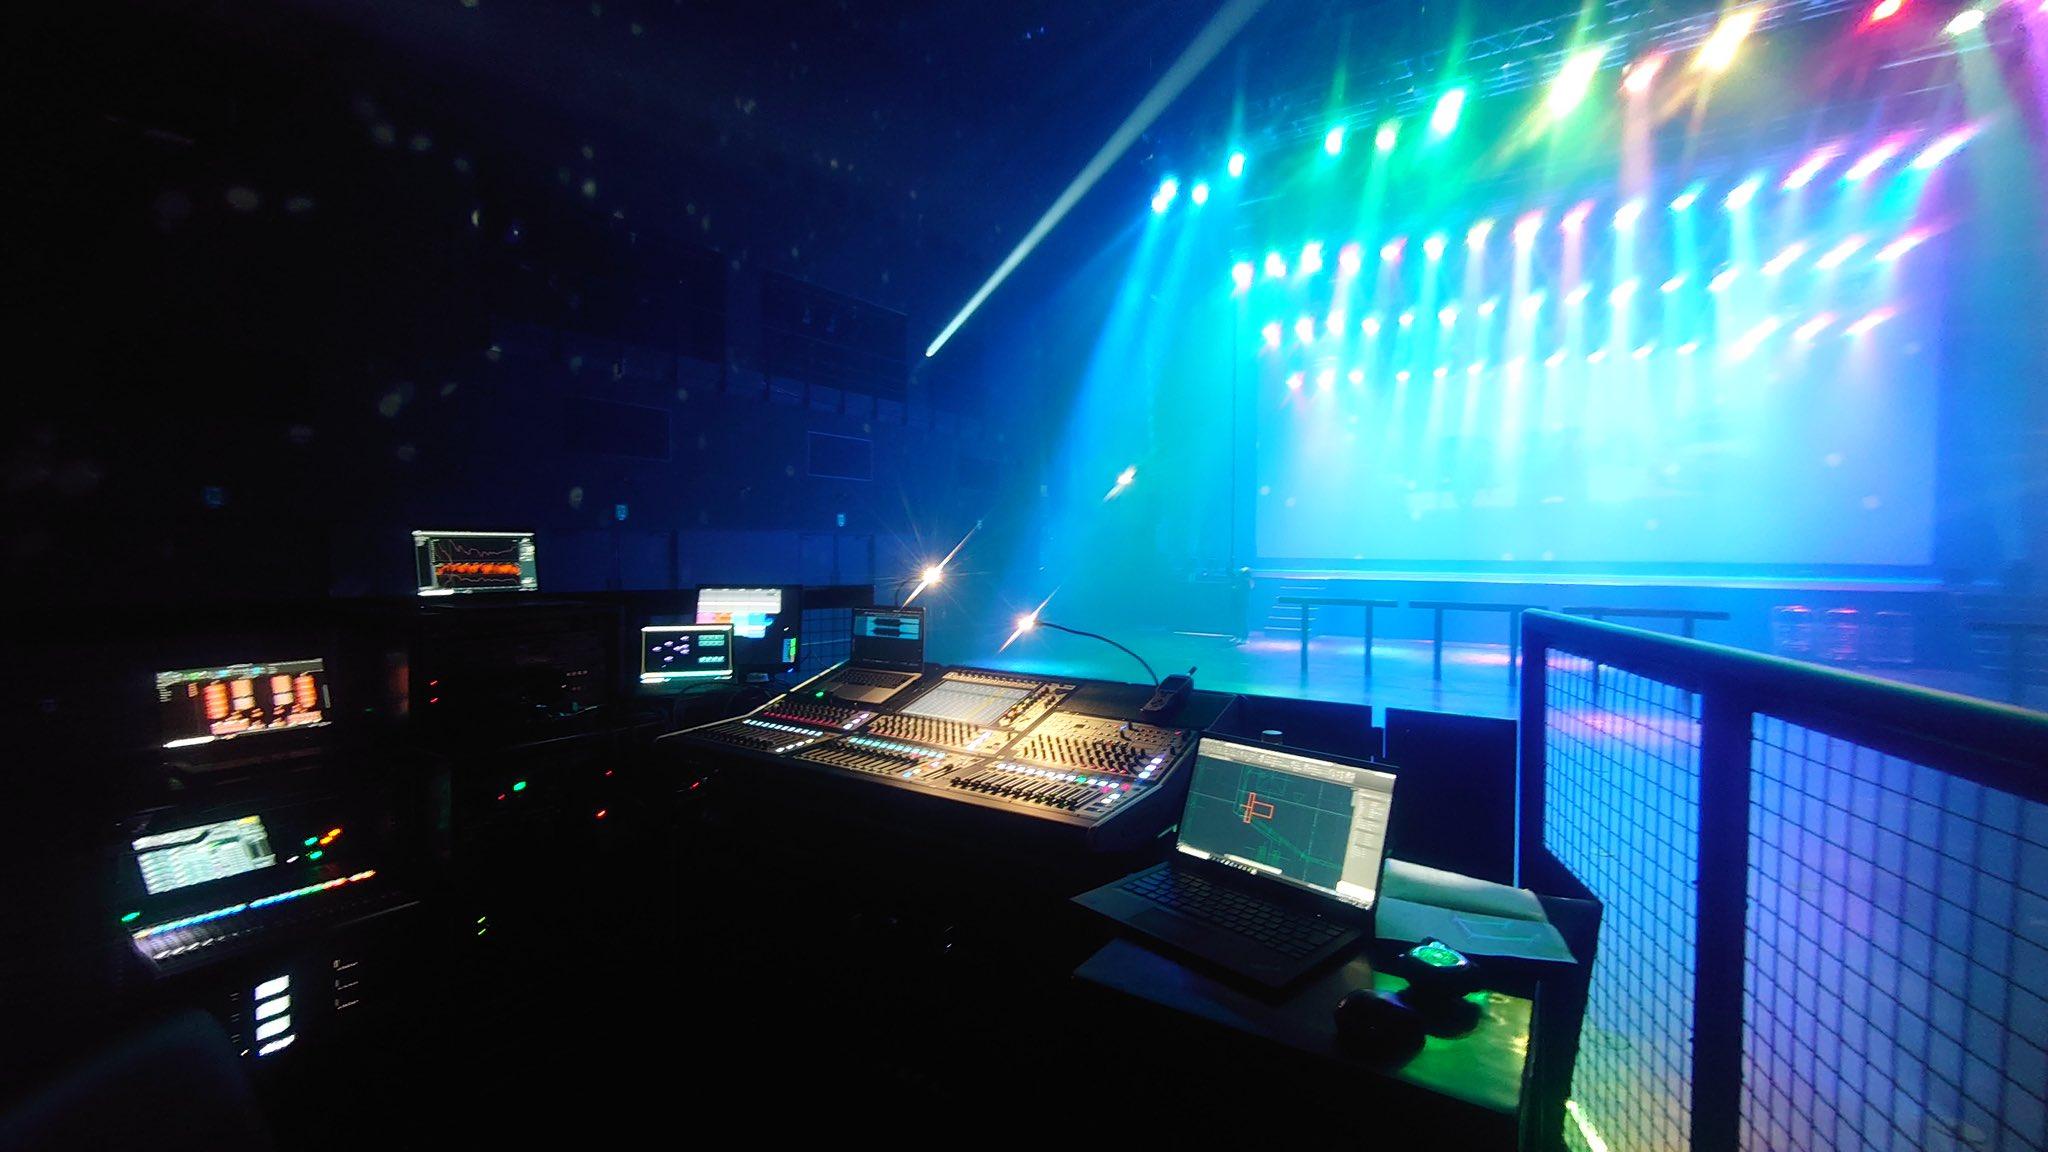 B'zが無観客配信ライブ『B'z SHOWCASE 2020 -5 ERAS 8820- Day1~5』を行ったZepp Haneda(TOKYO)の内観写真